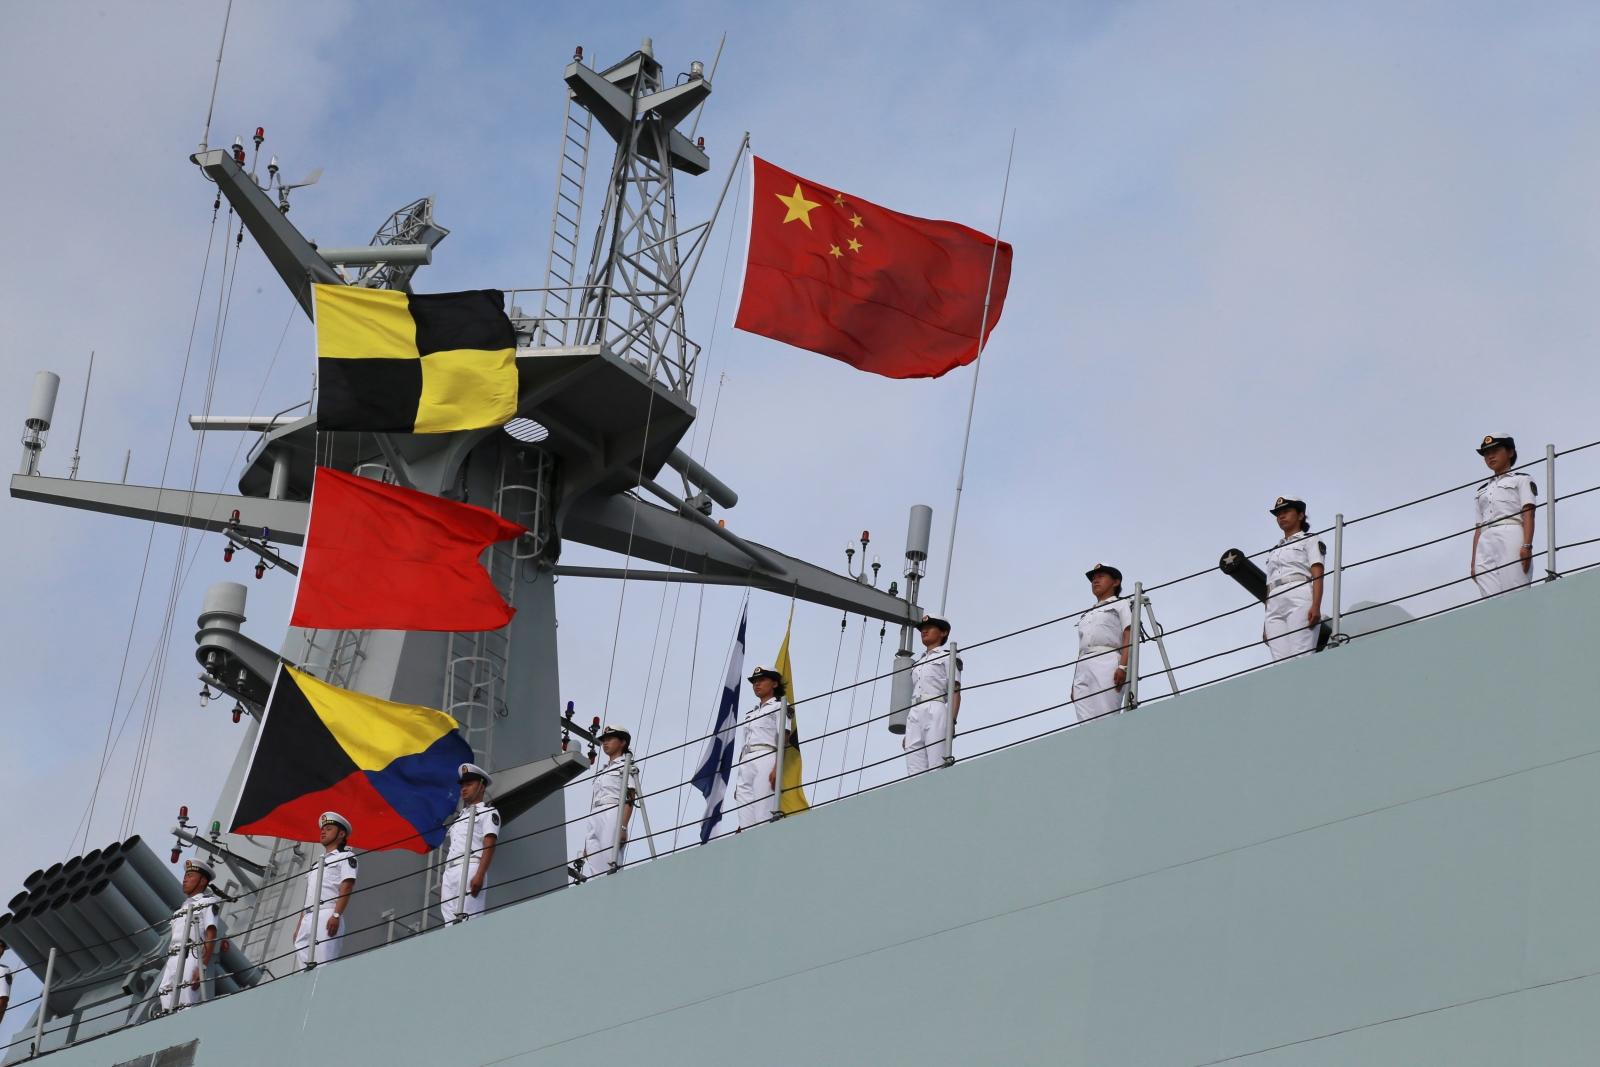 Chine military base in Djibouti